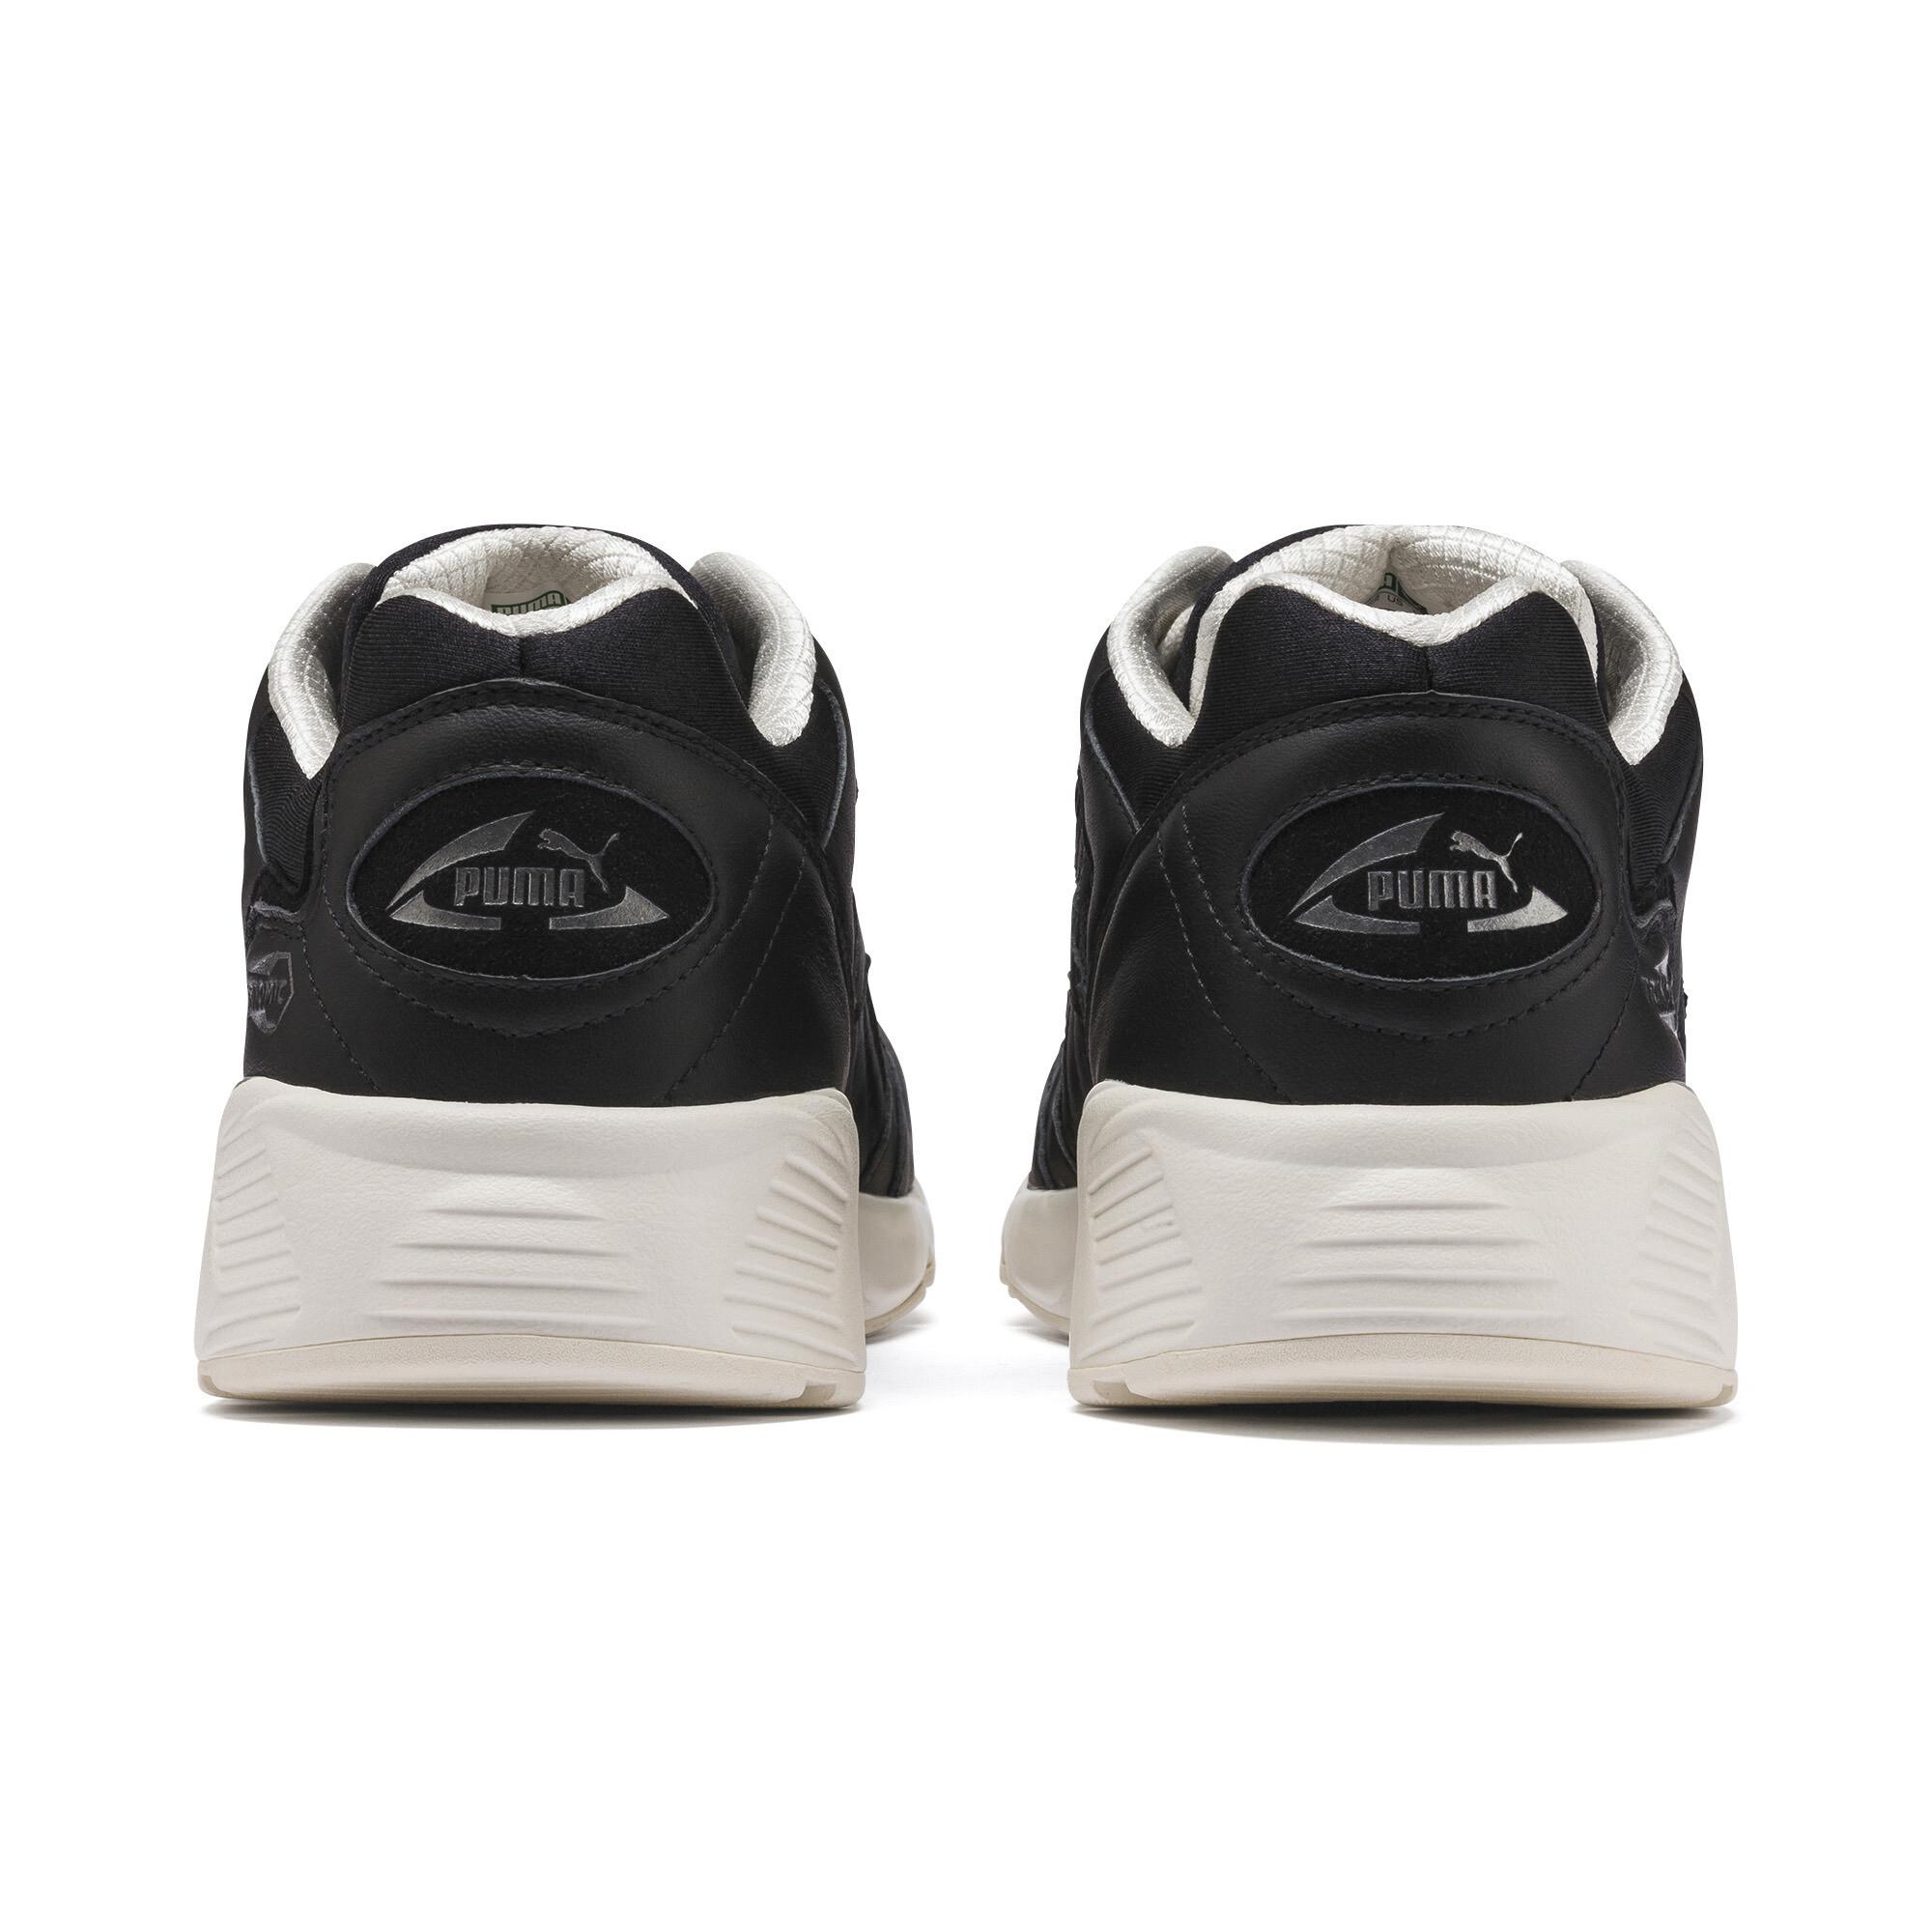 PUMA-Prevail-IR-Reality-Sneakers-Unisex-Shoe thumbnail 9